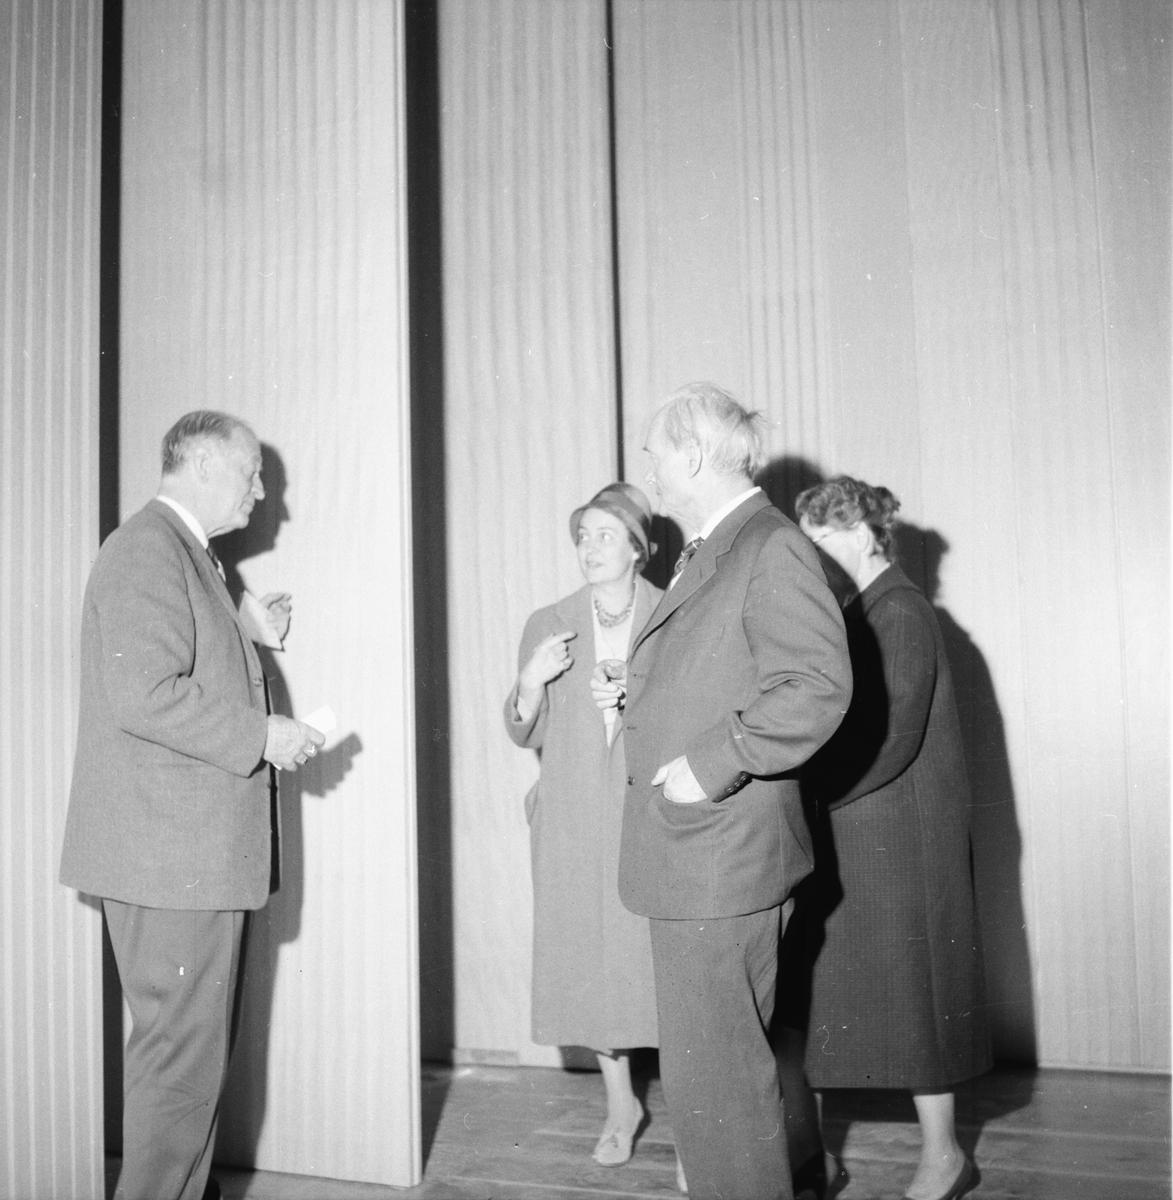 Silvanum, Gävle 8 okt. 1960